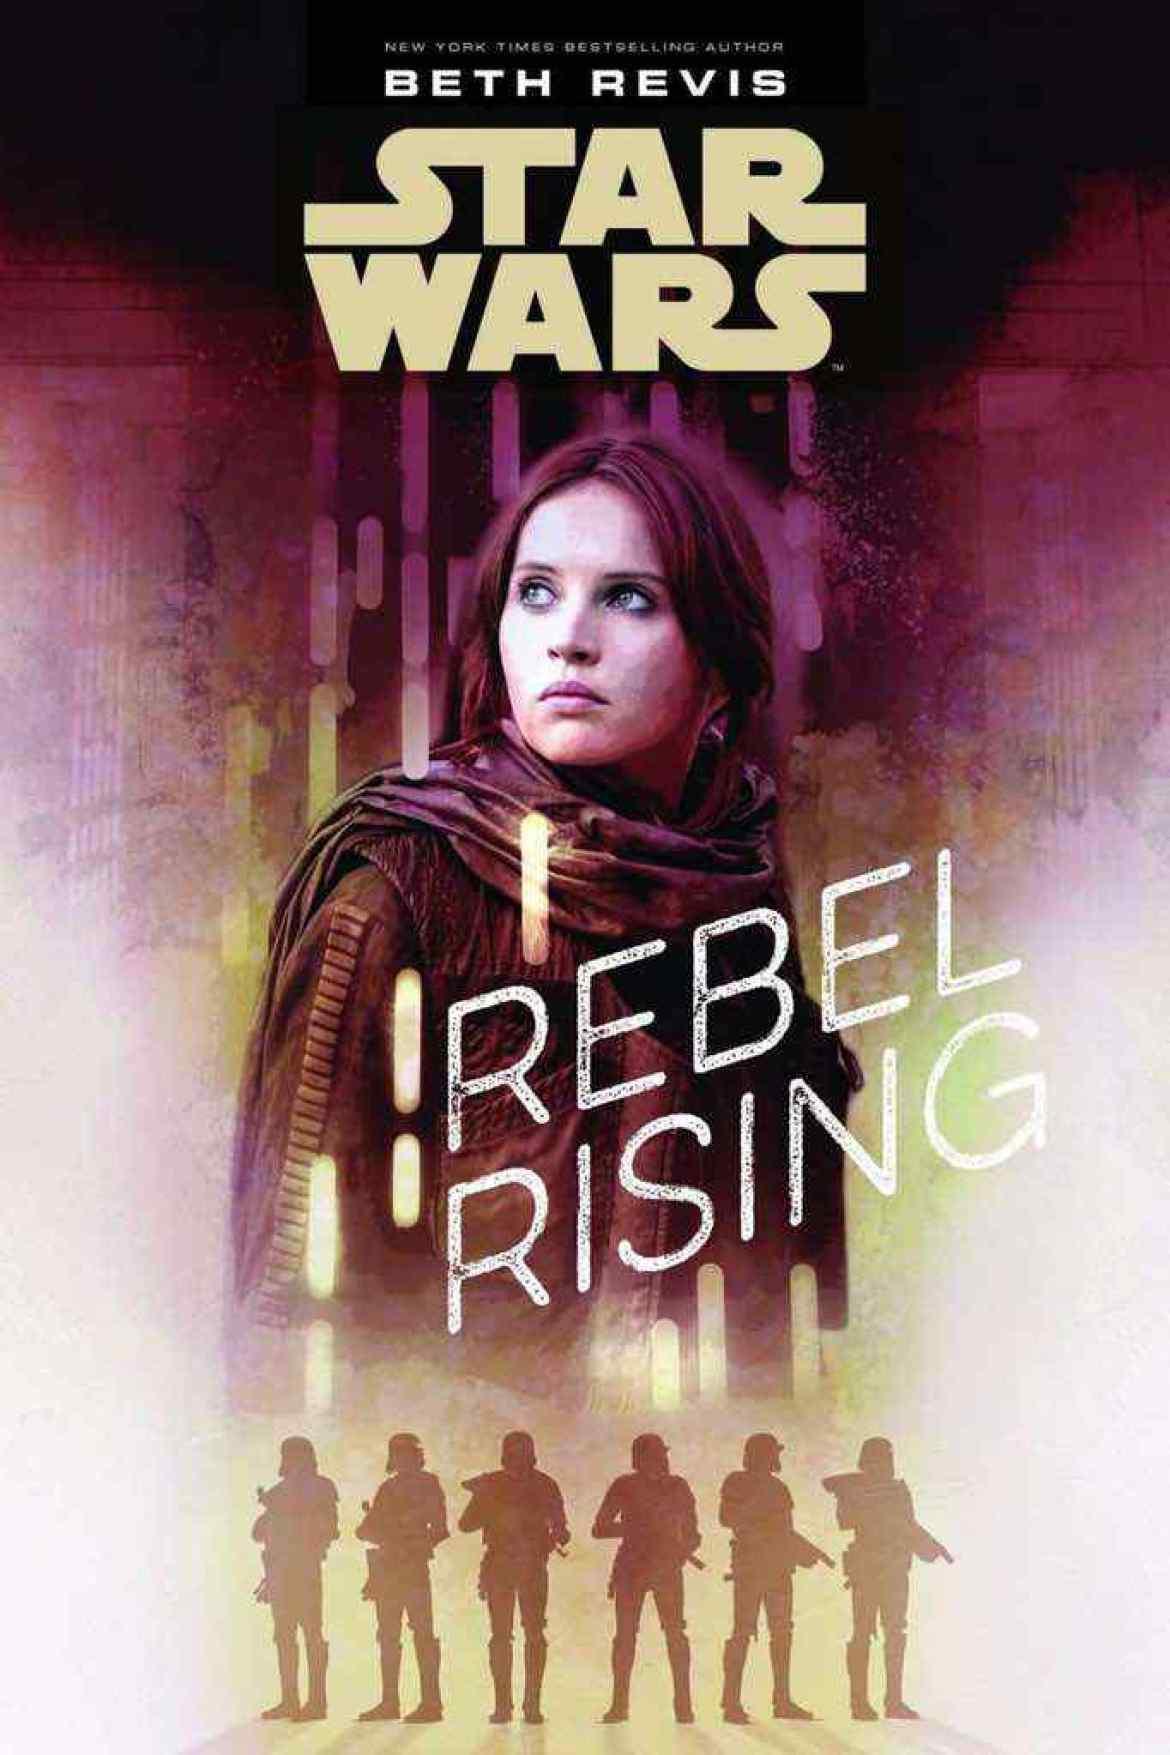 IMG 6359 - Star Wars: Rebel Rising novel to tell Jyn Erso's backstory!